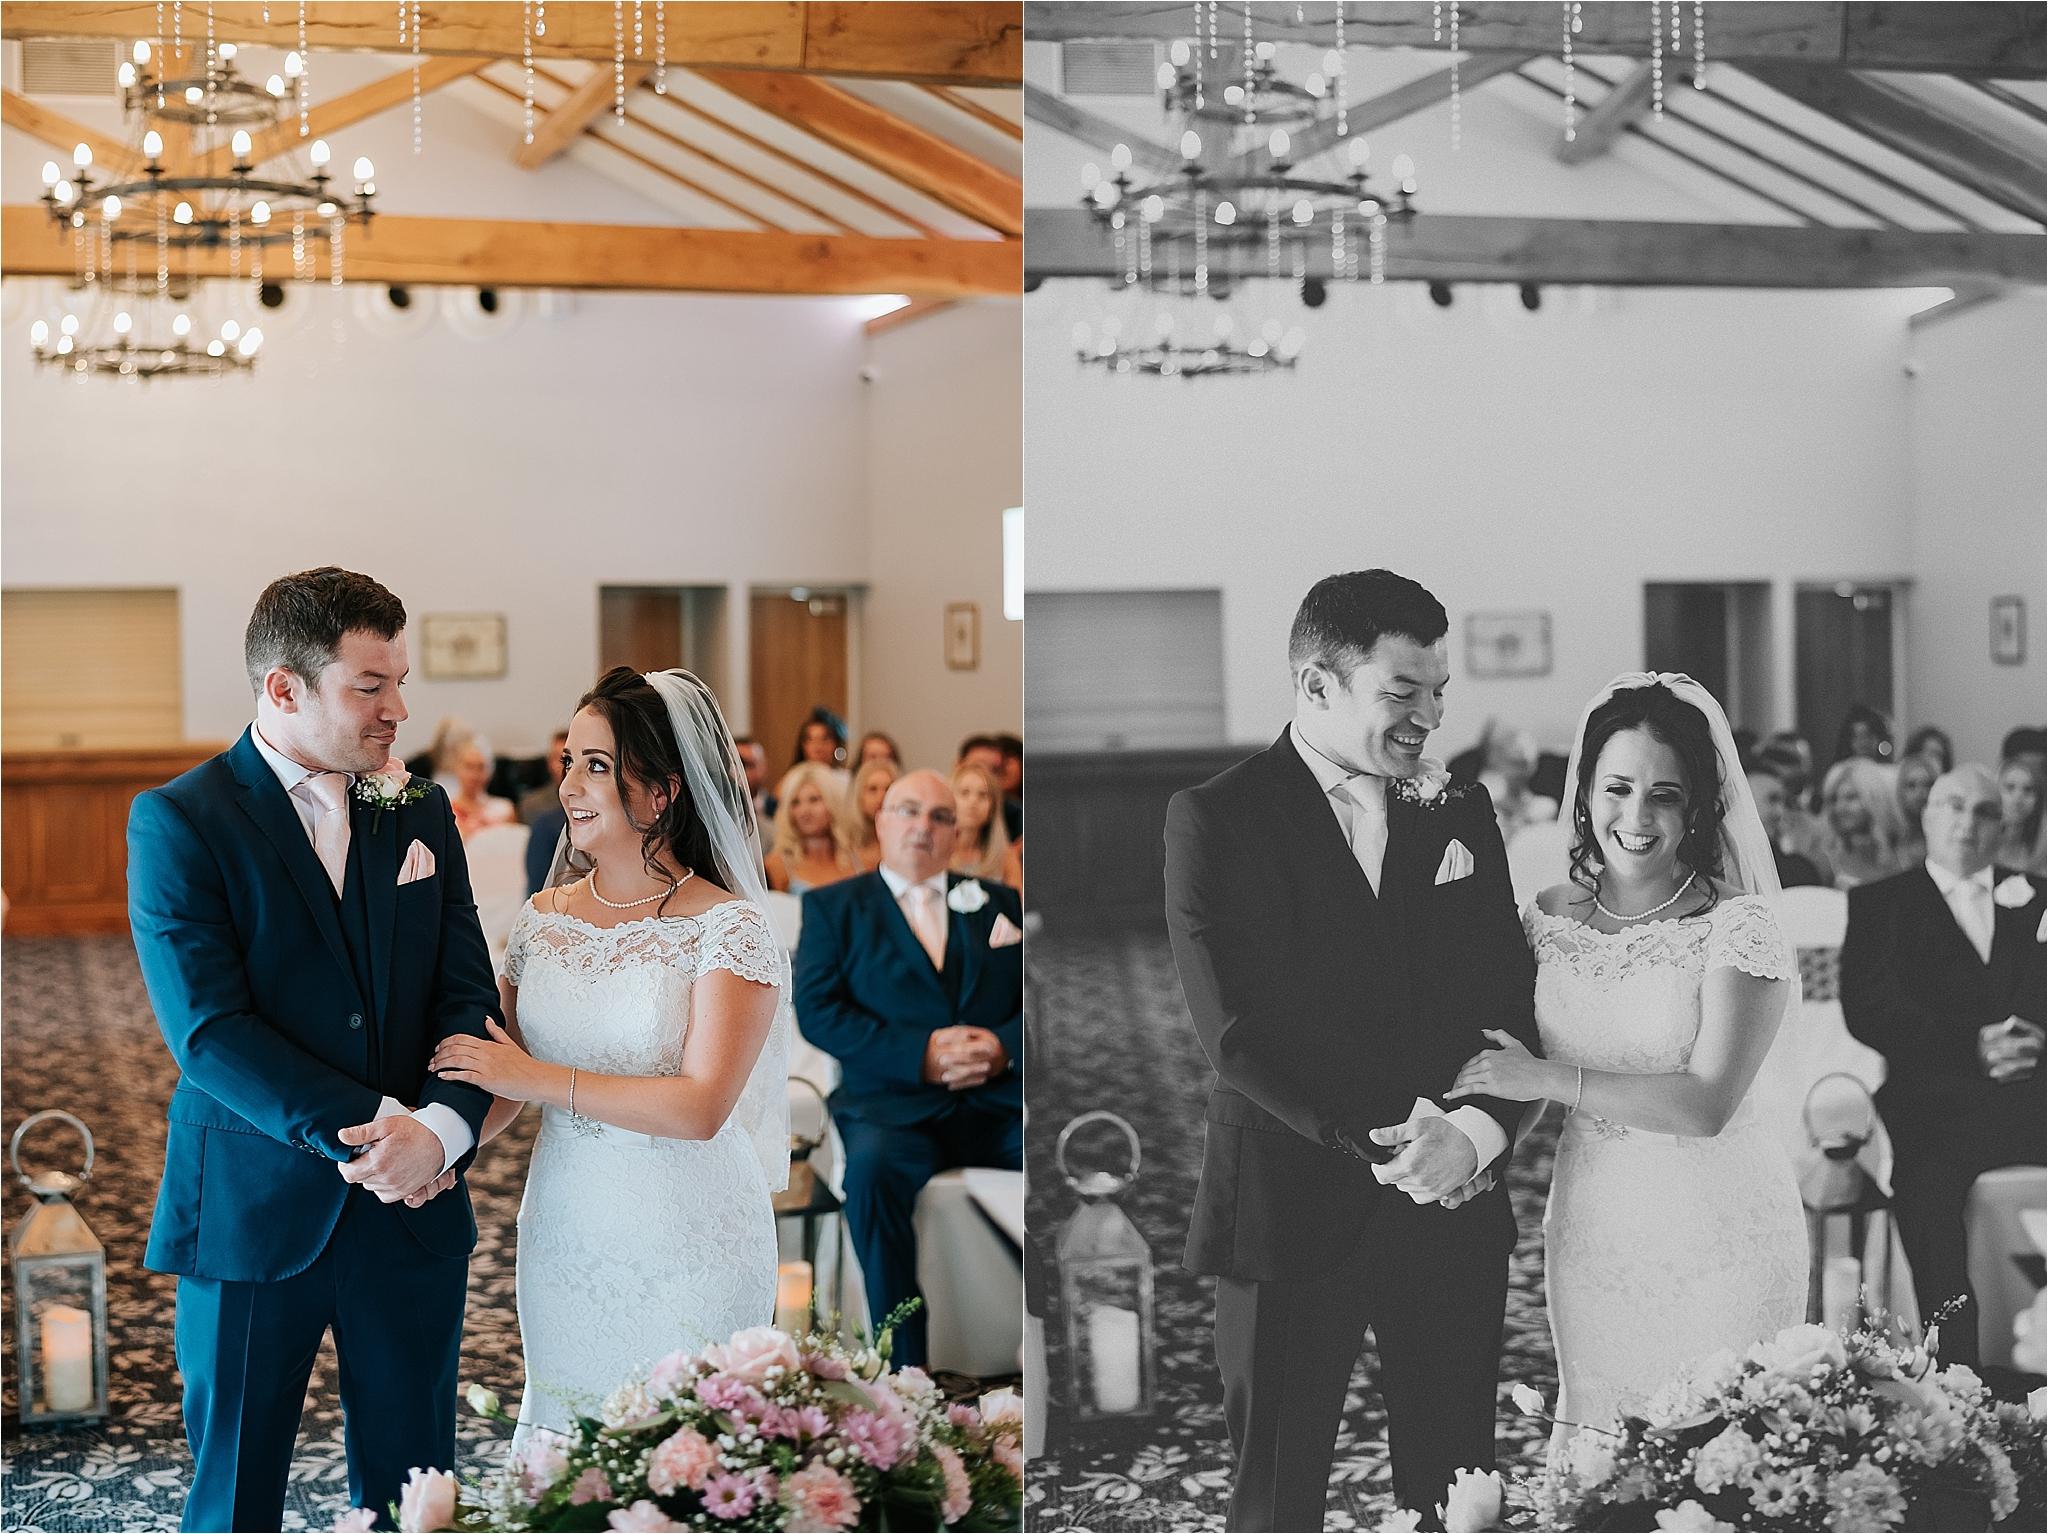 thevilla+lancashire+wreagreen+wedding+photographer25.jpg